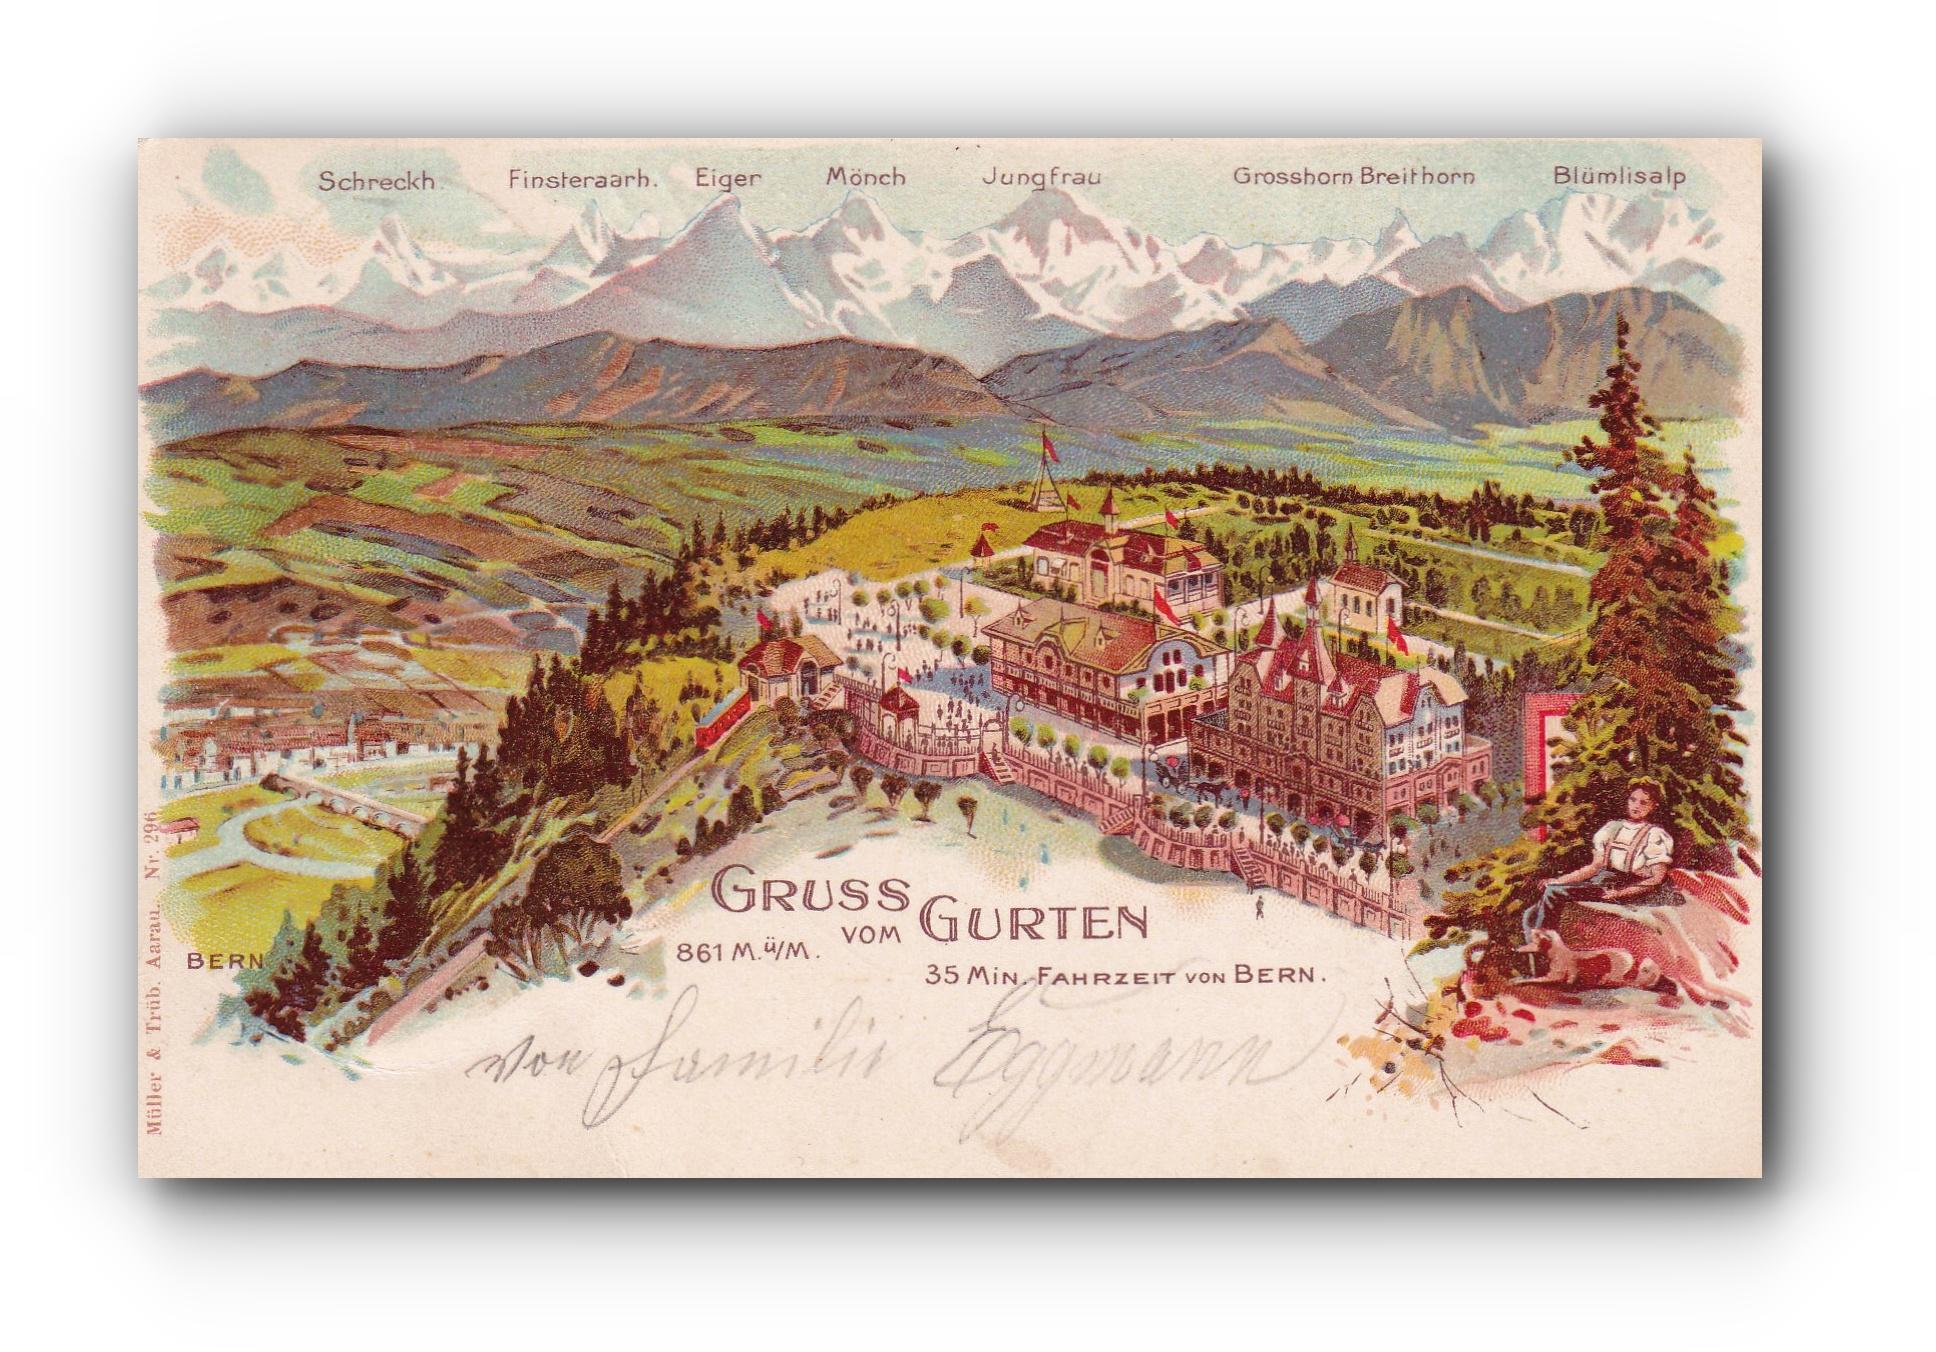 Gruss vom Gurten - 10.09.1900 - Salutations depuis le Gurten - Greetings from the Gurten